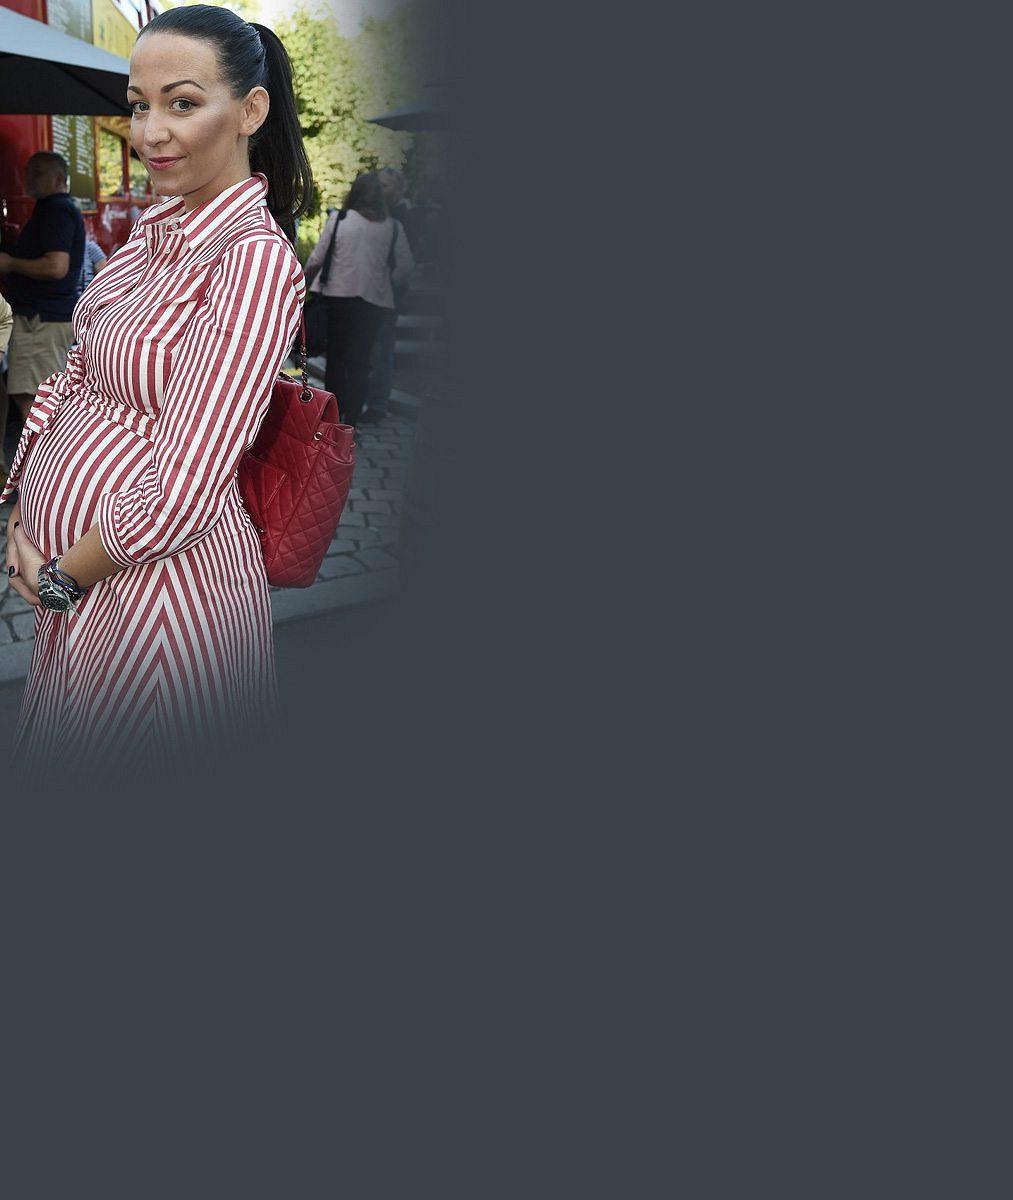 Už drandí s kočárem: Takhle vypadá dvojnásobná mamina Agáta Prachařová týden po porodu dcery